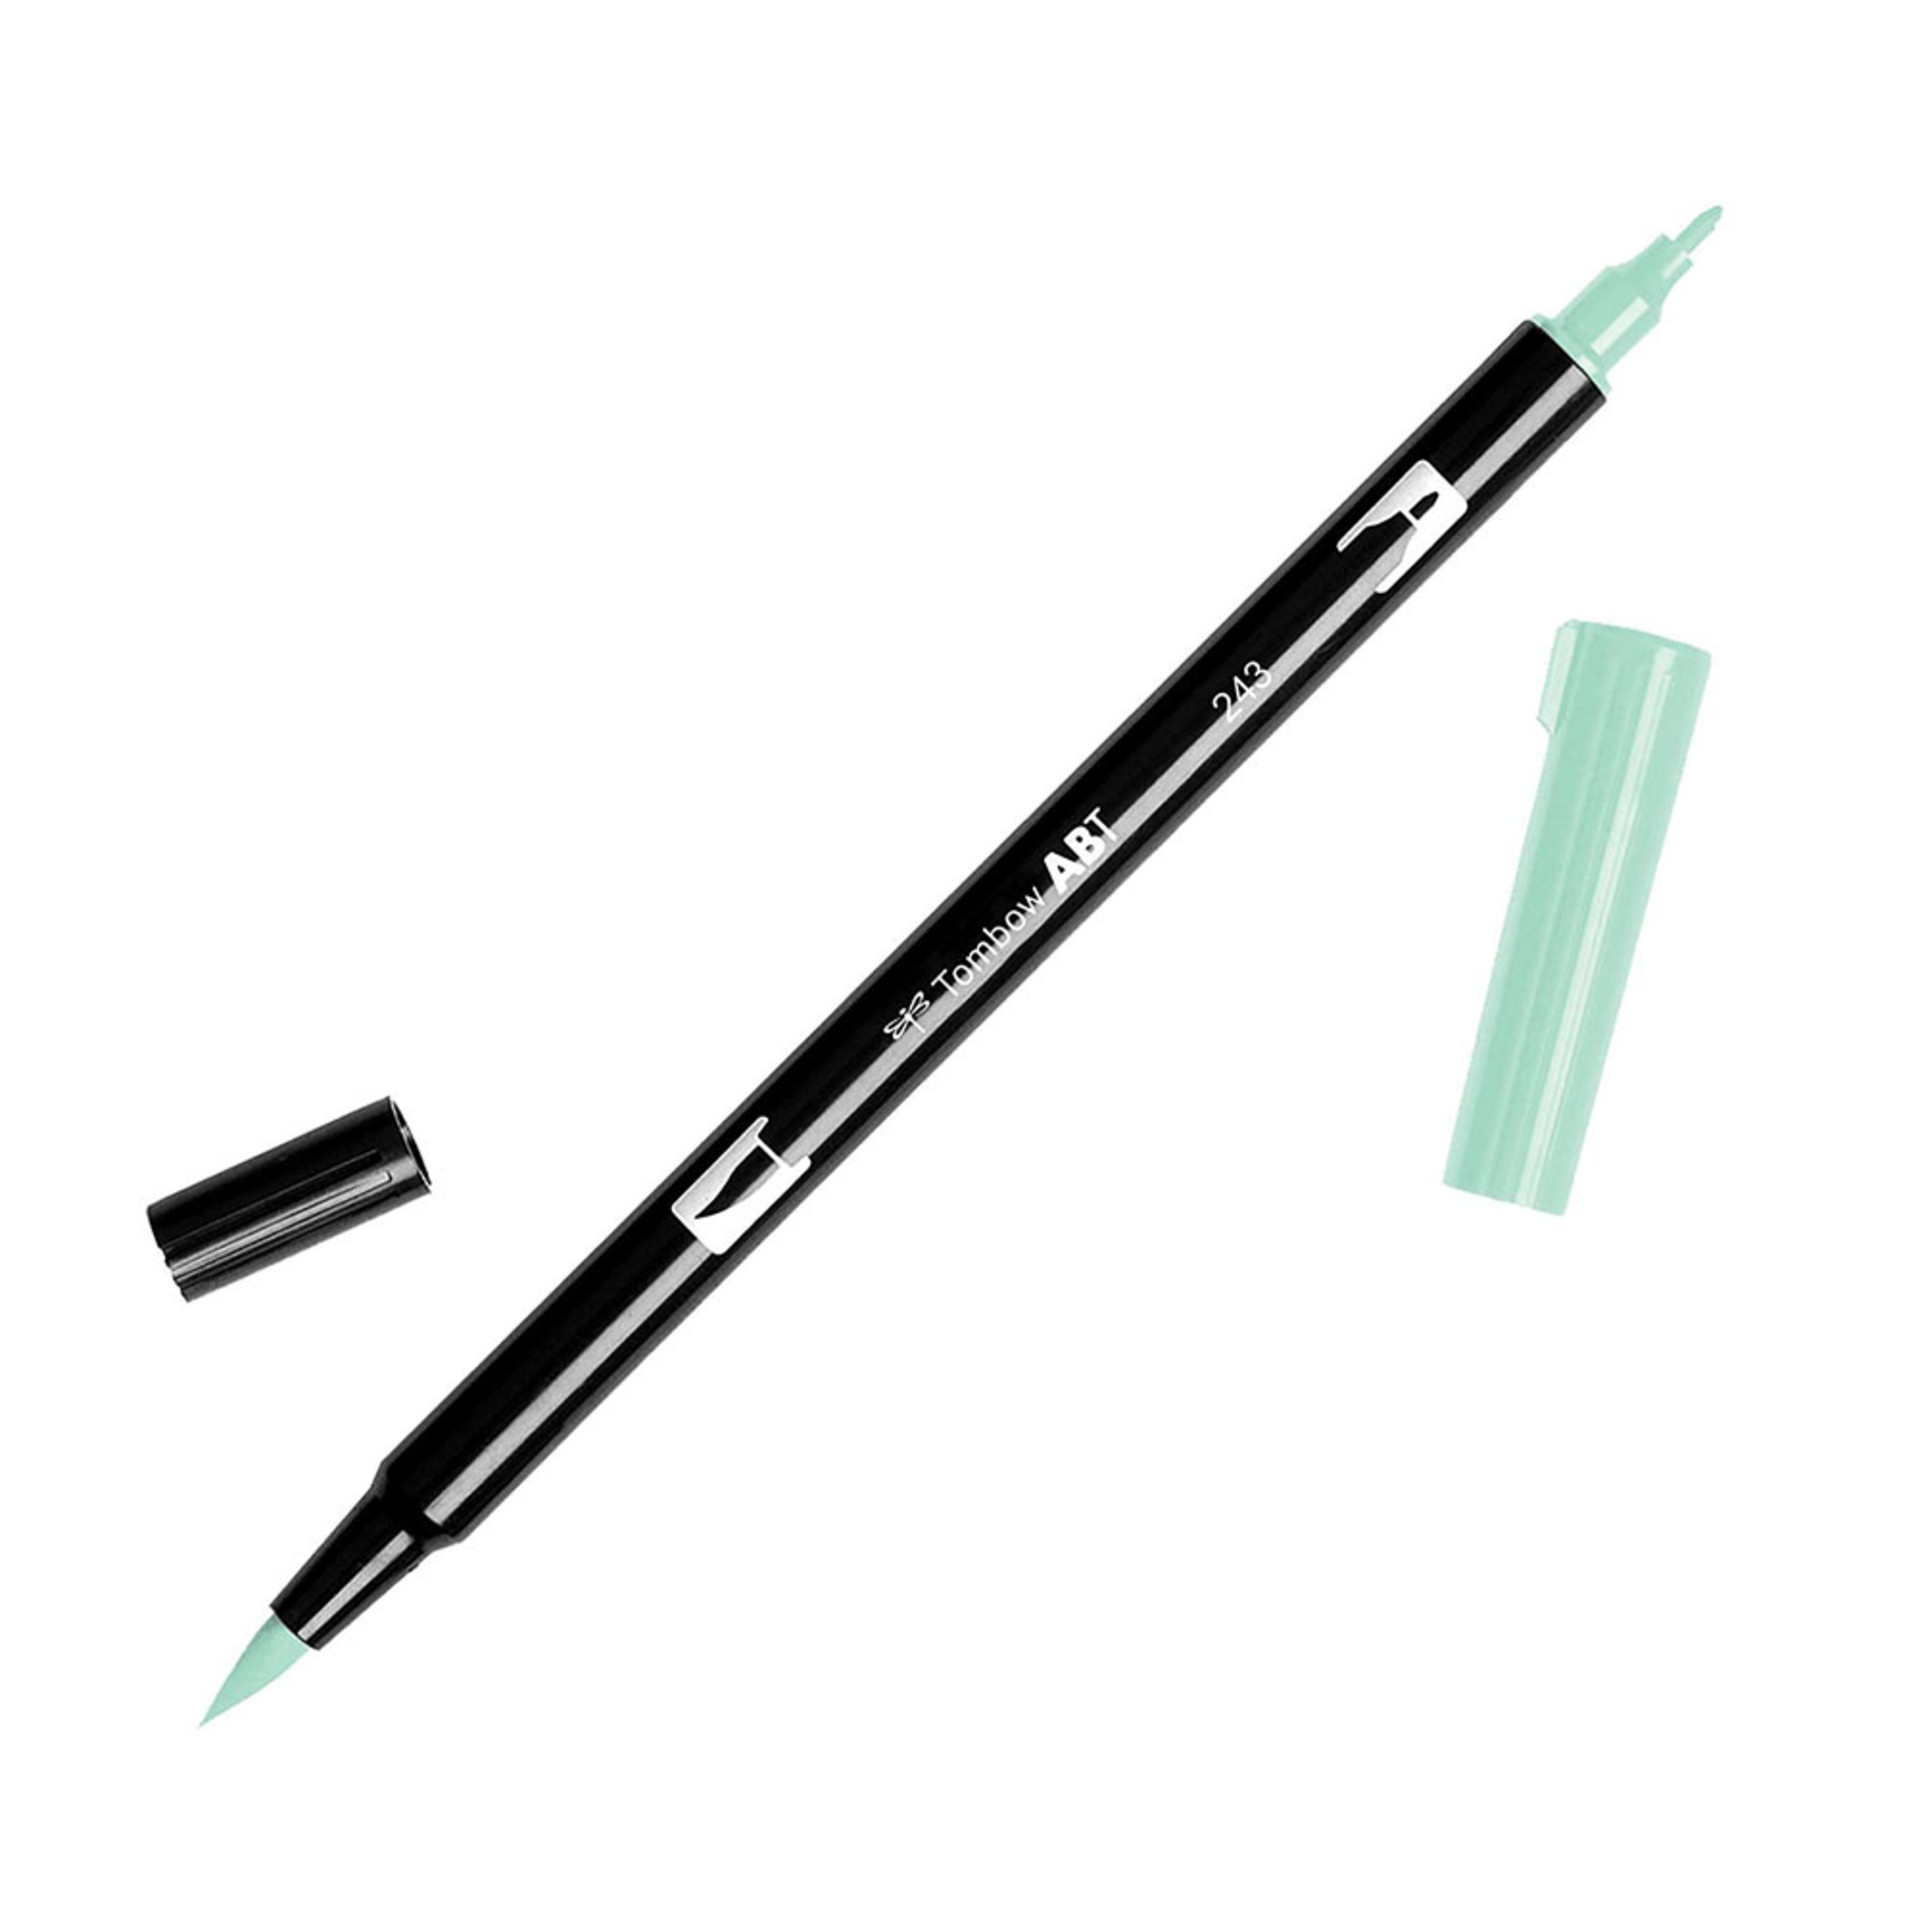 Tombow Dual-Tip Brush Marker Pen – Mint